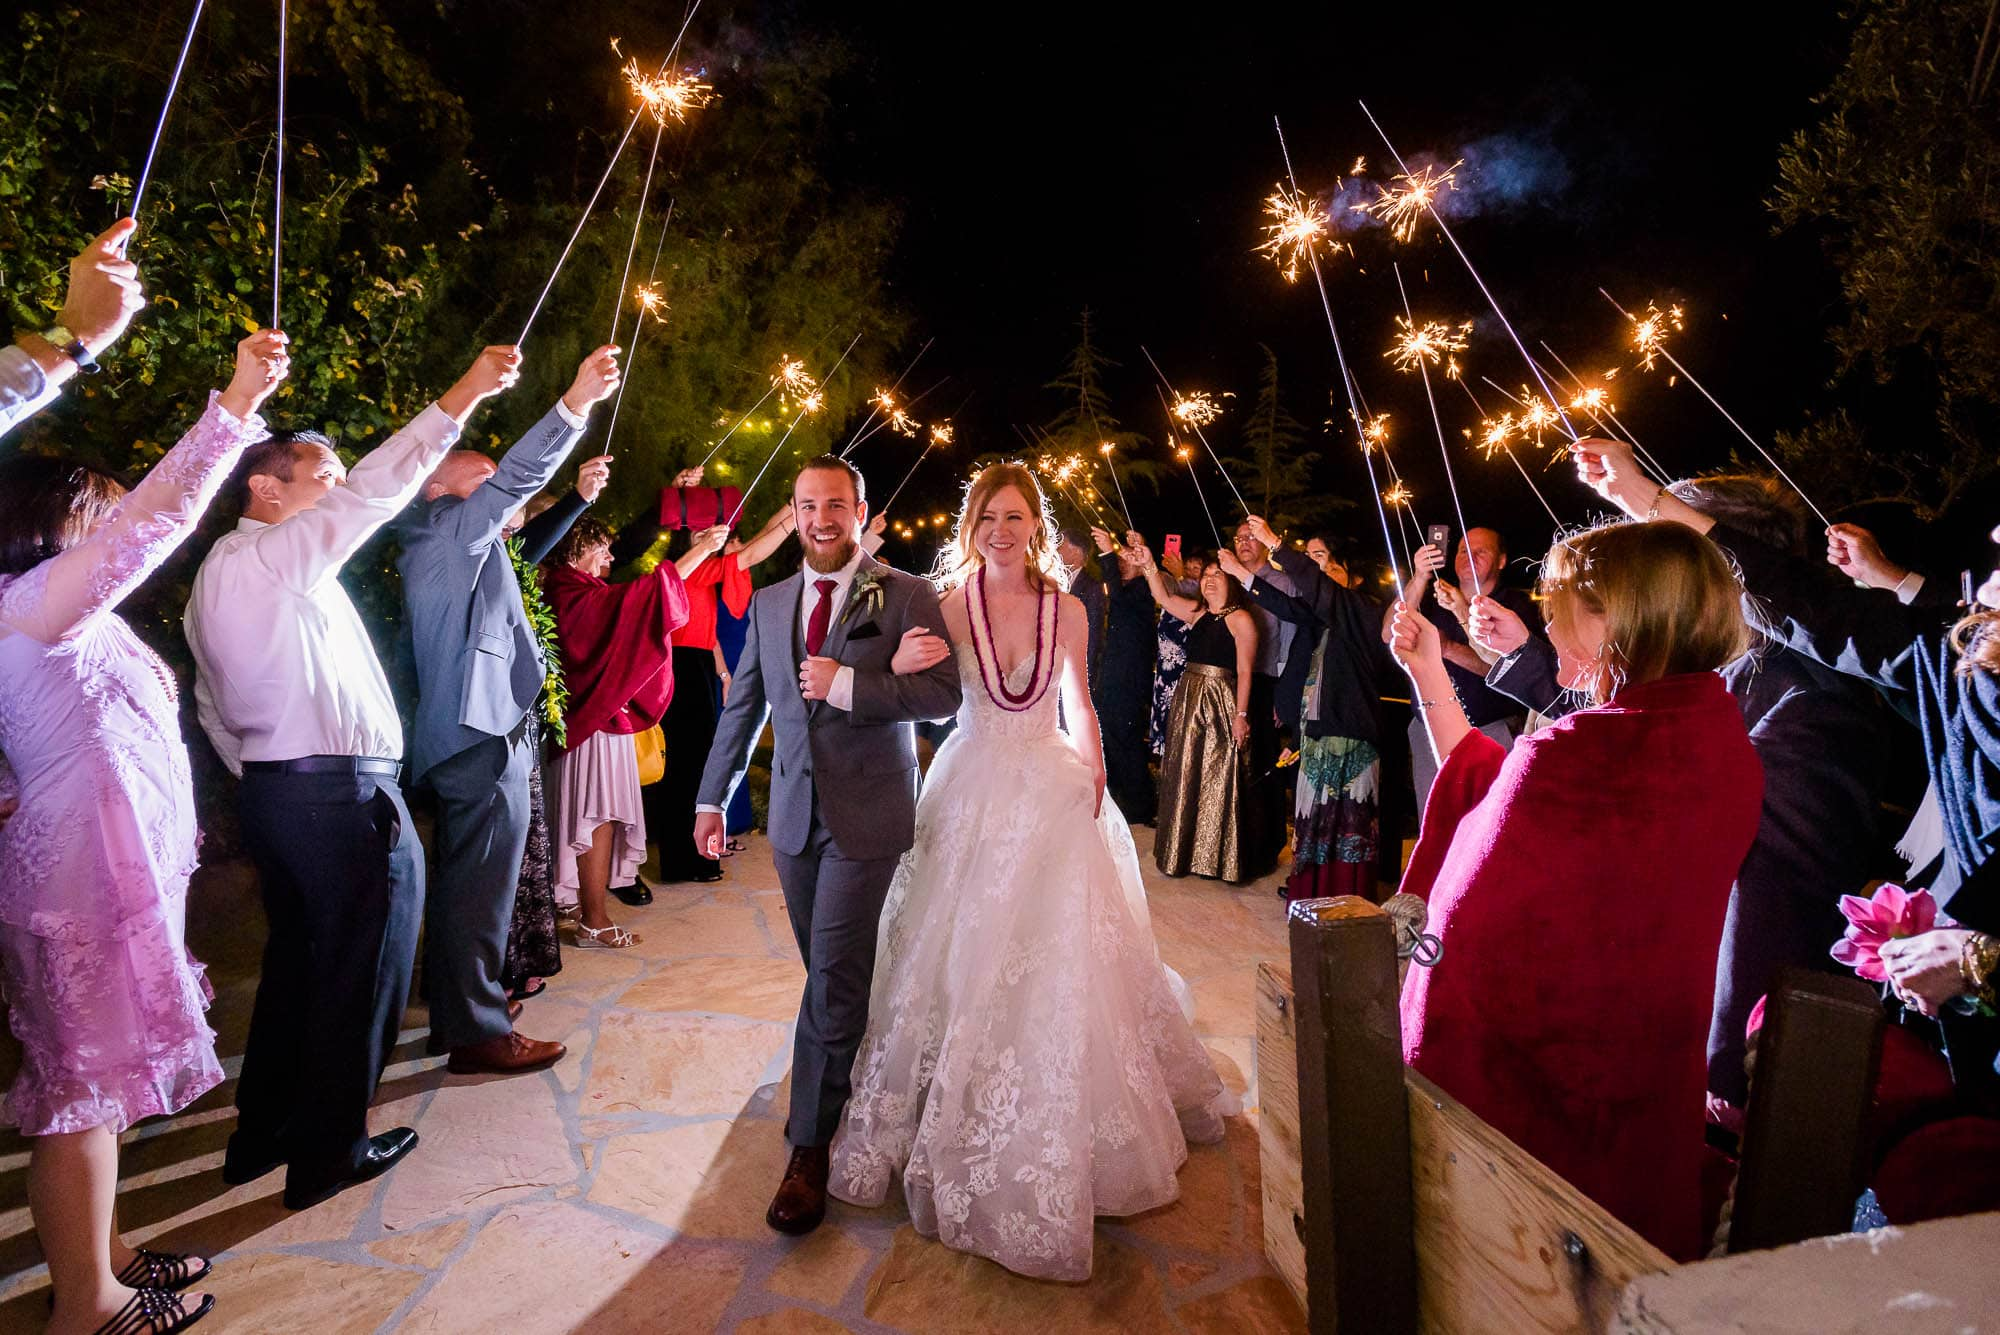 815_Alan_and_Heidi_Serendipity_Garden_Wedding_10-27-2018